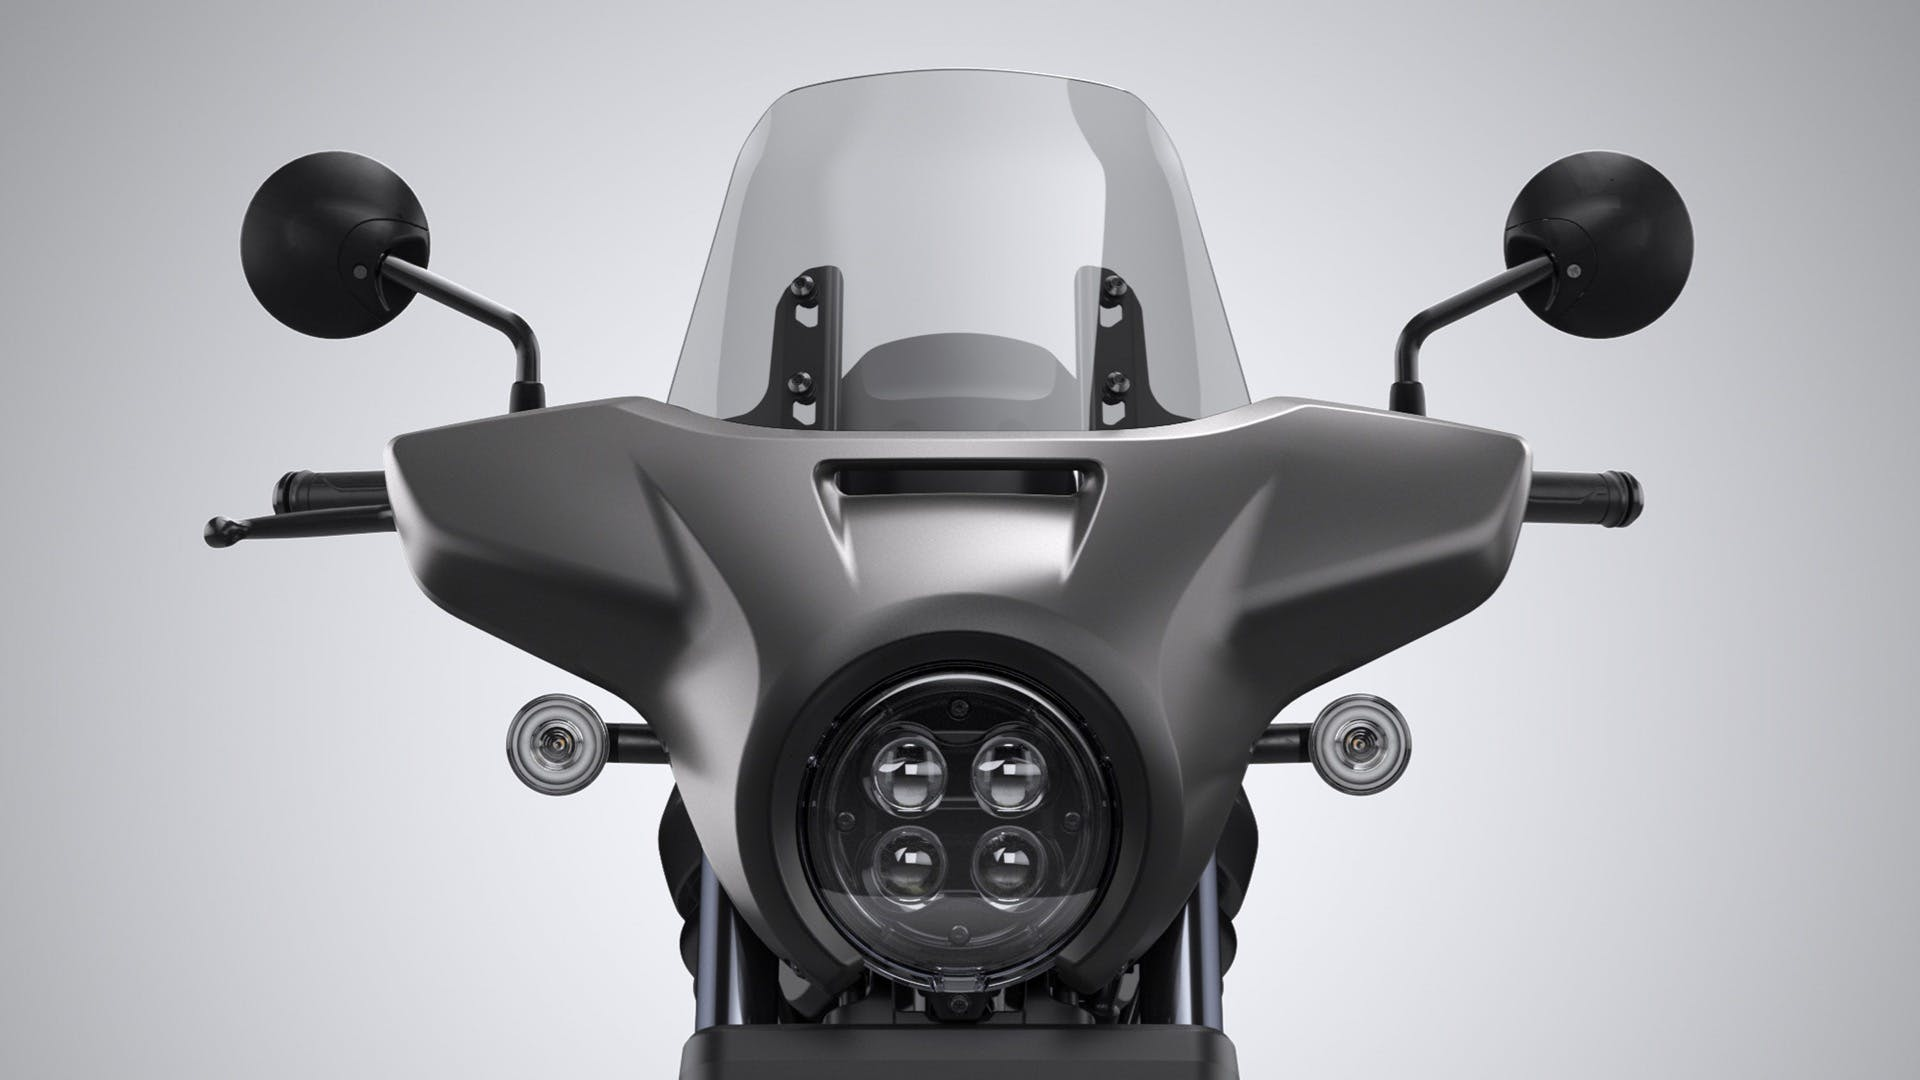 Honda CMX1100 Rebel DCT cupolino